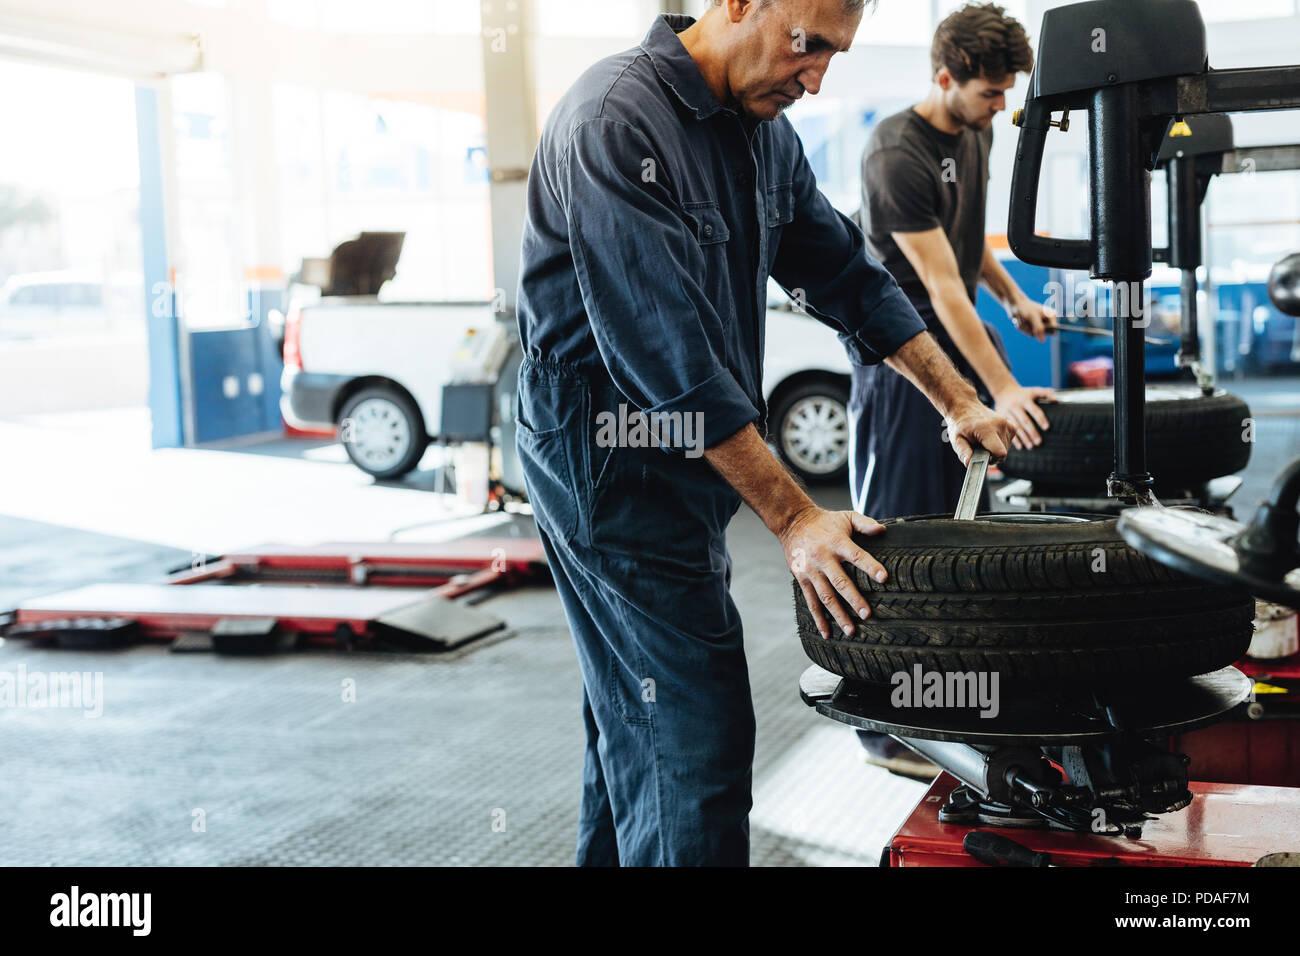 Mechanics working in car repair workshop. Auto repair workers working on tire replacing machine in auto repair shop. - Stock Image